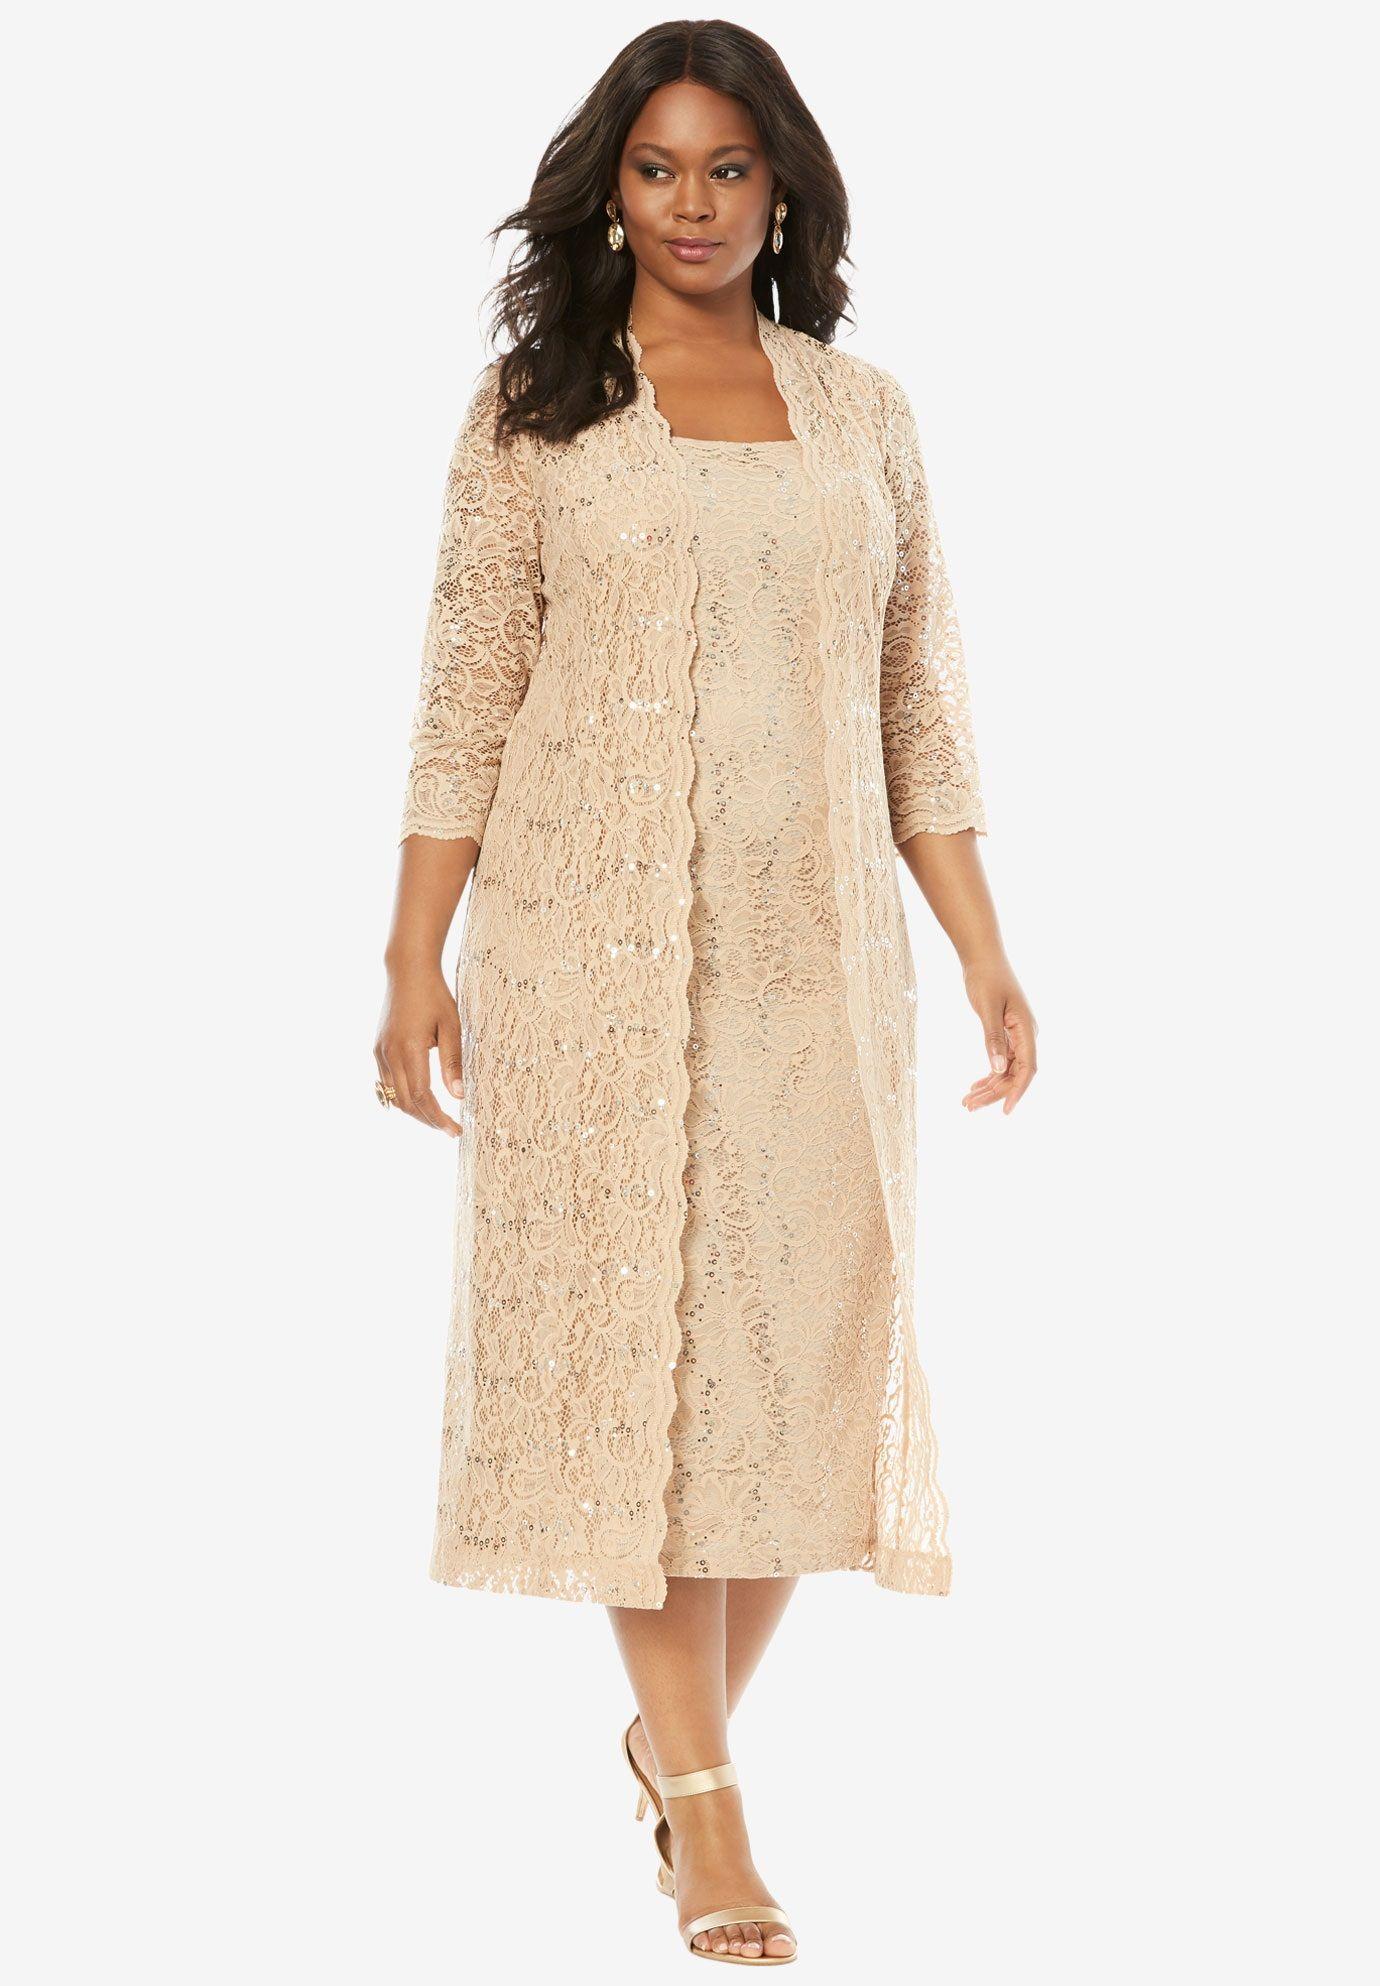 8cd91335095 Lace Duster Jacket Dress